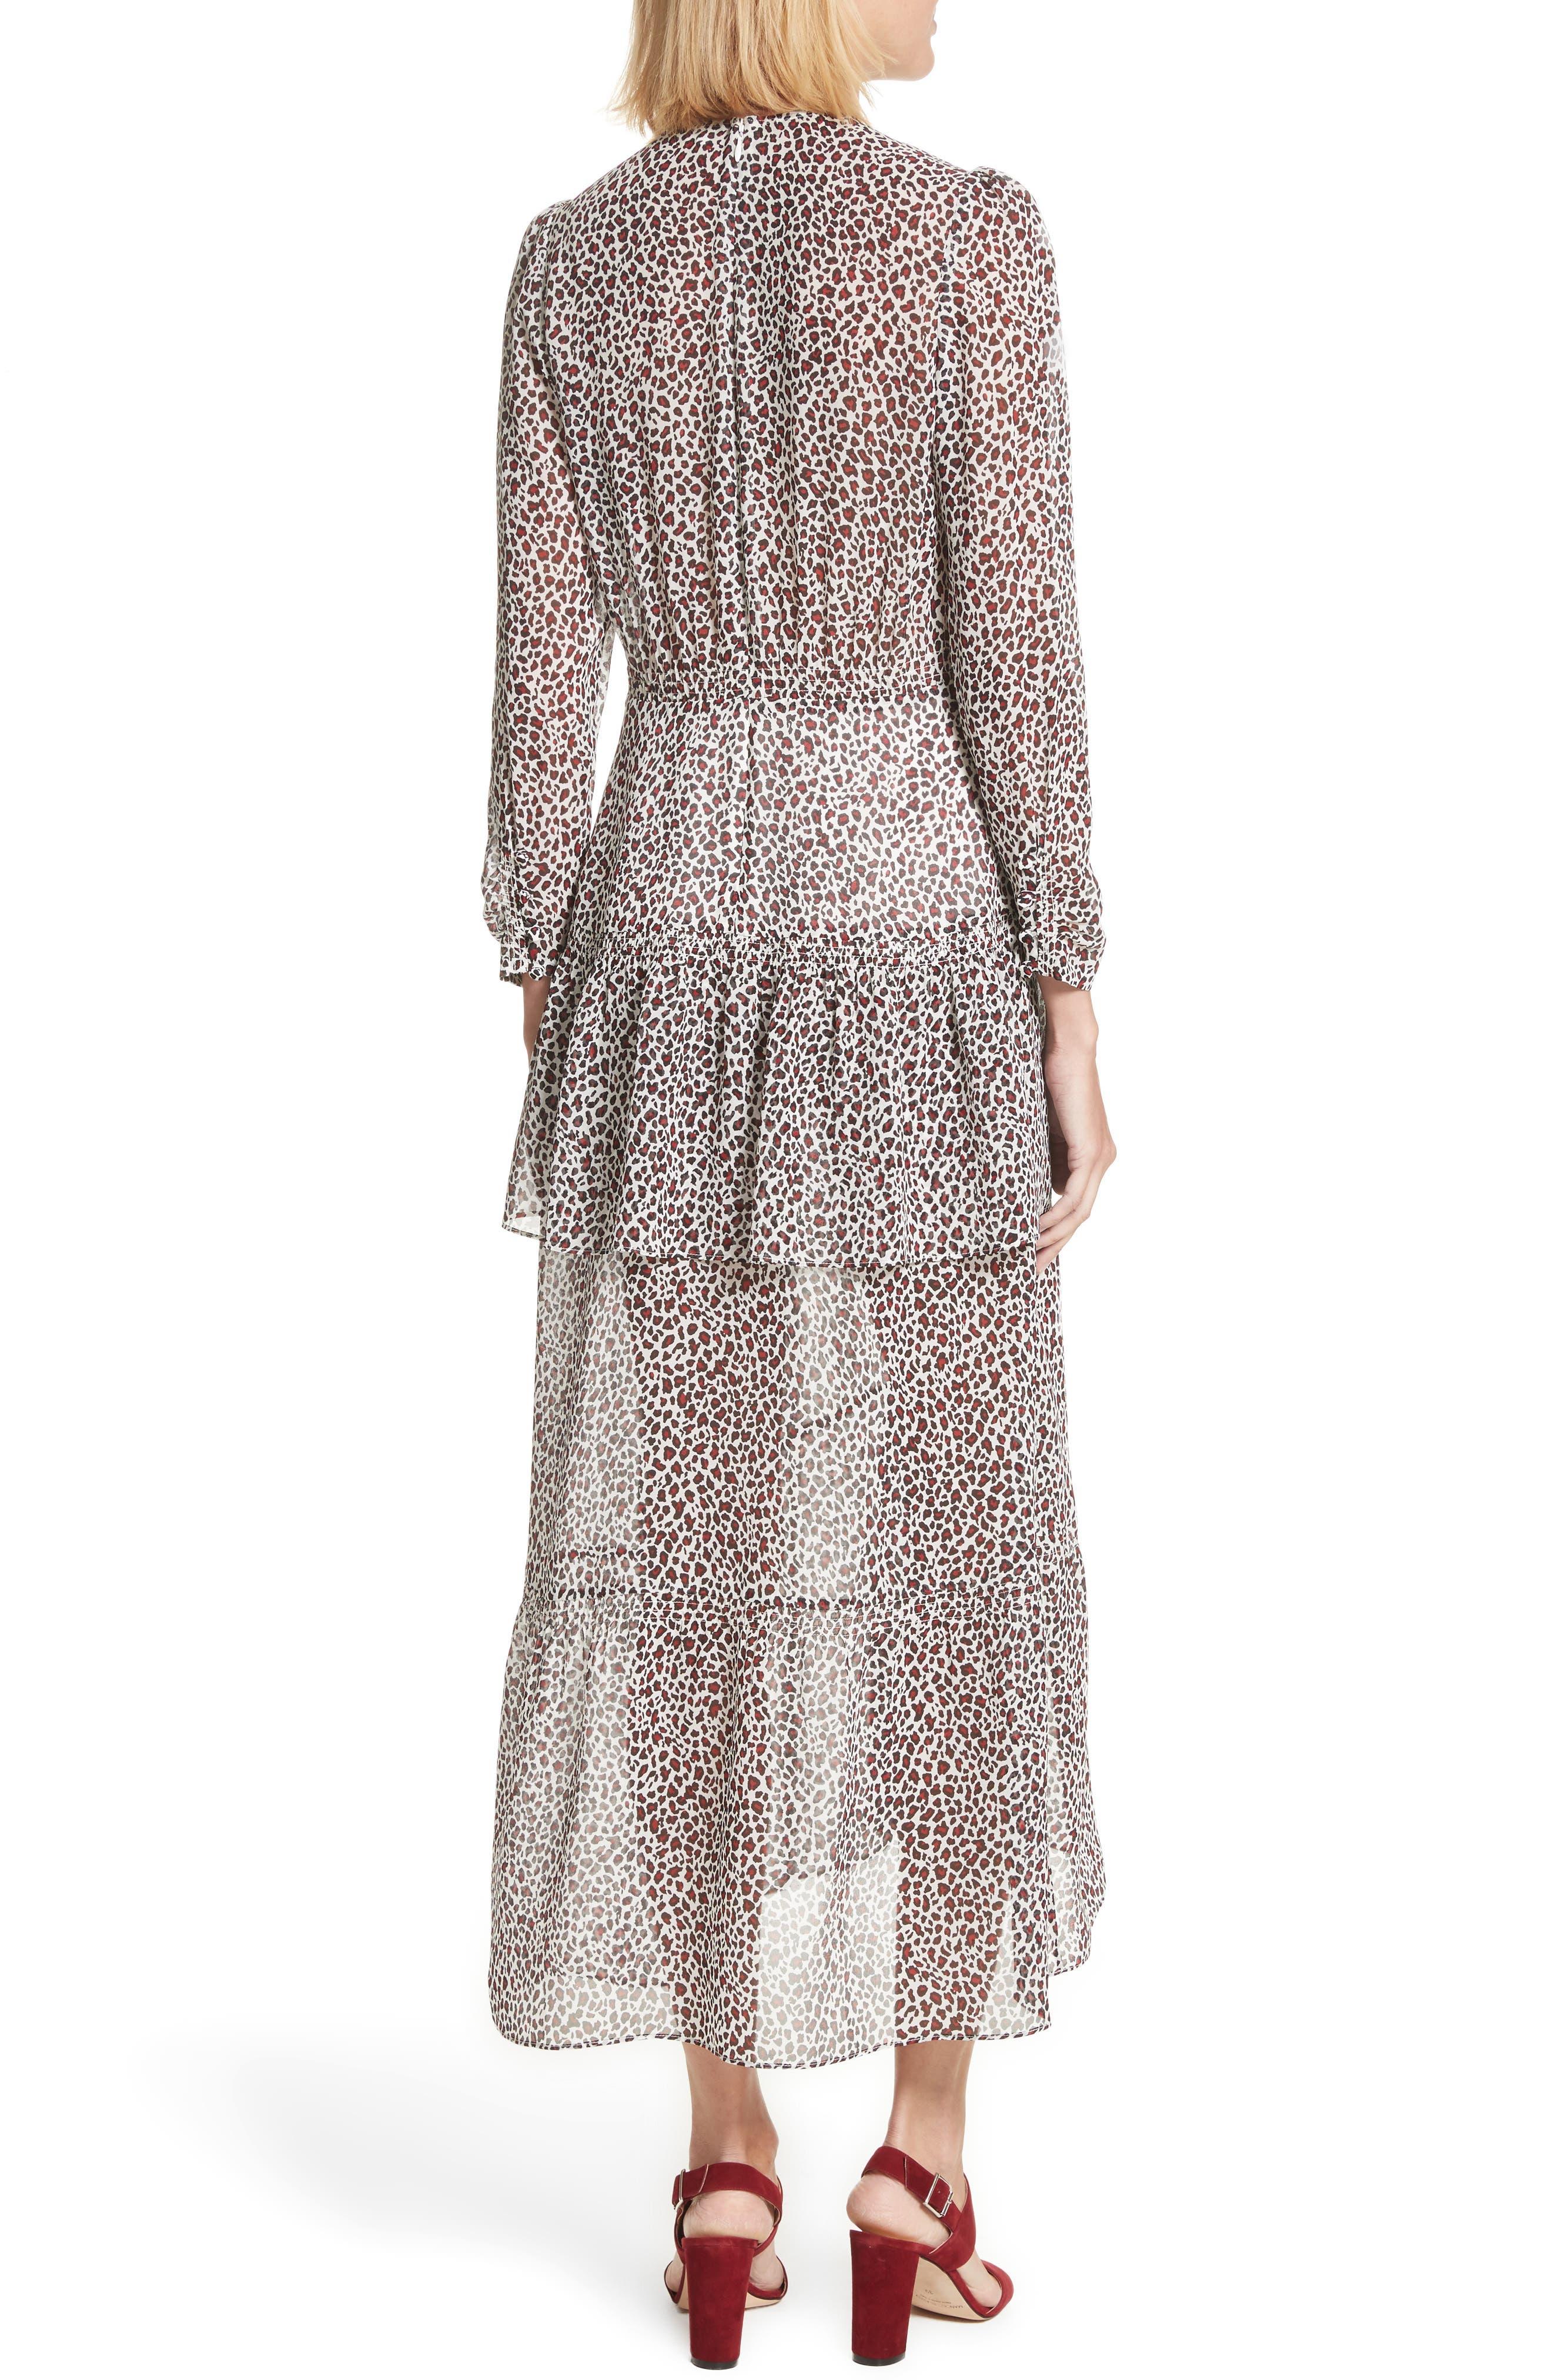 Zandra Leopard Print Silk Midi Dress,                             Alternate thumbnail 2, color,                             901